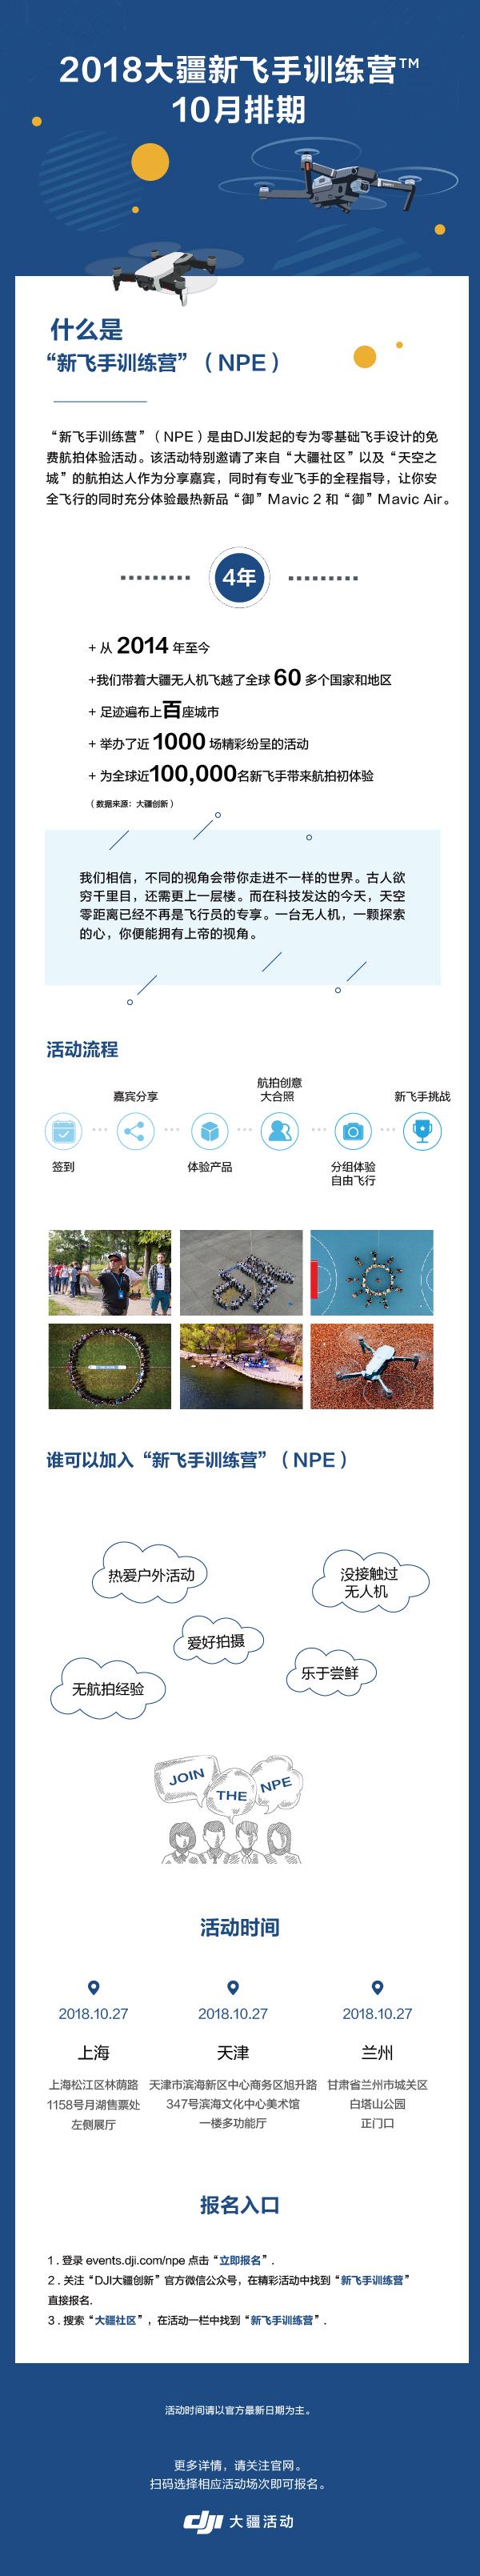 NPE活动宣传页_10月排期.jpg